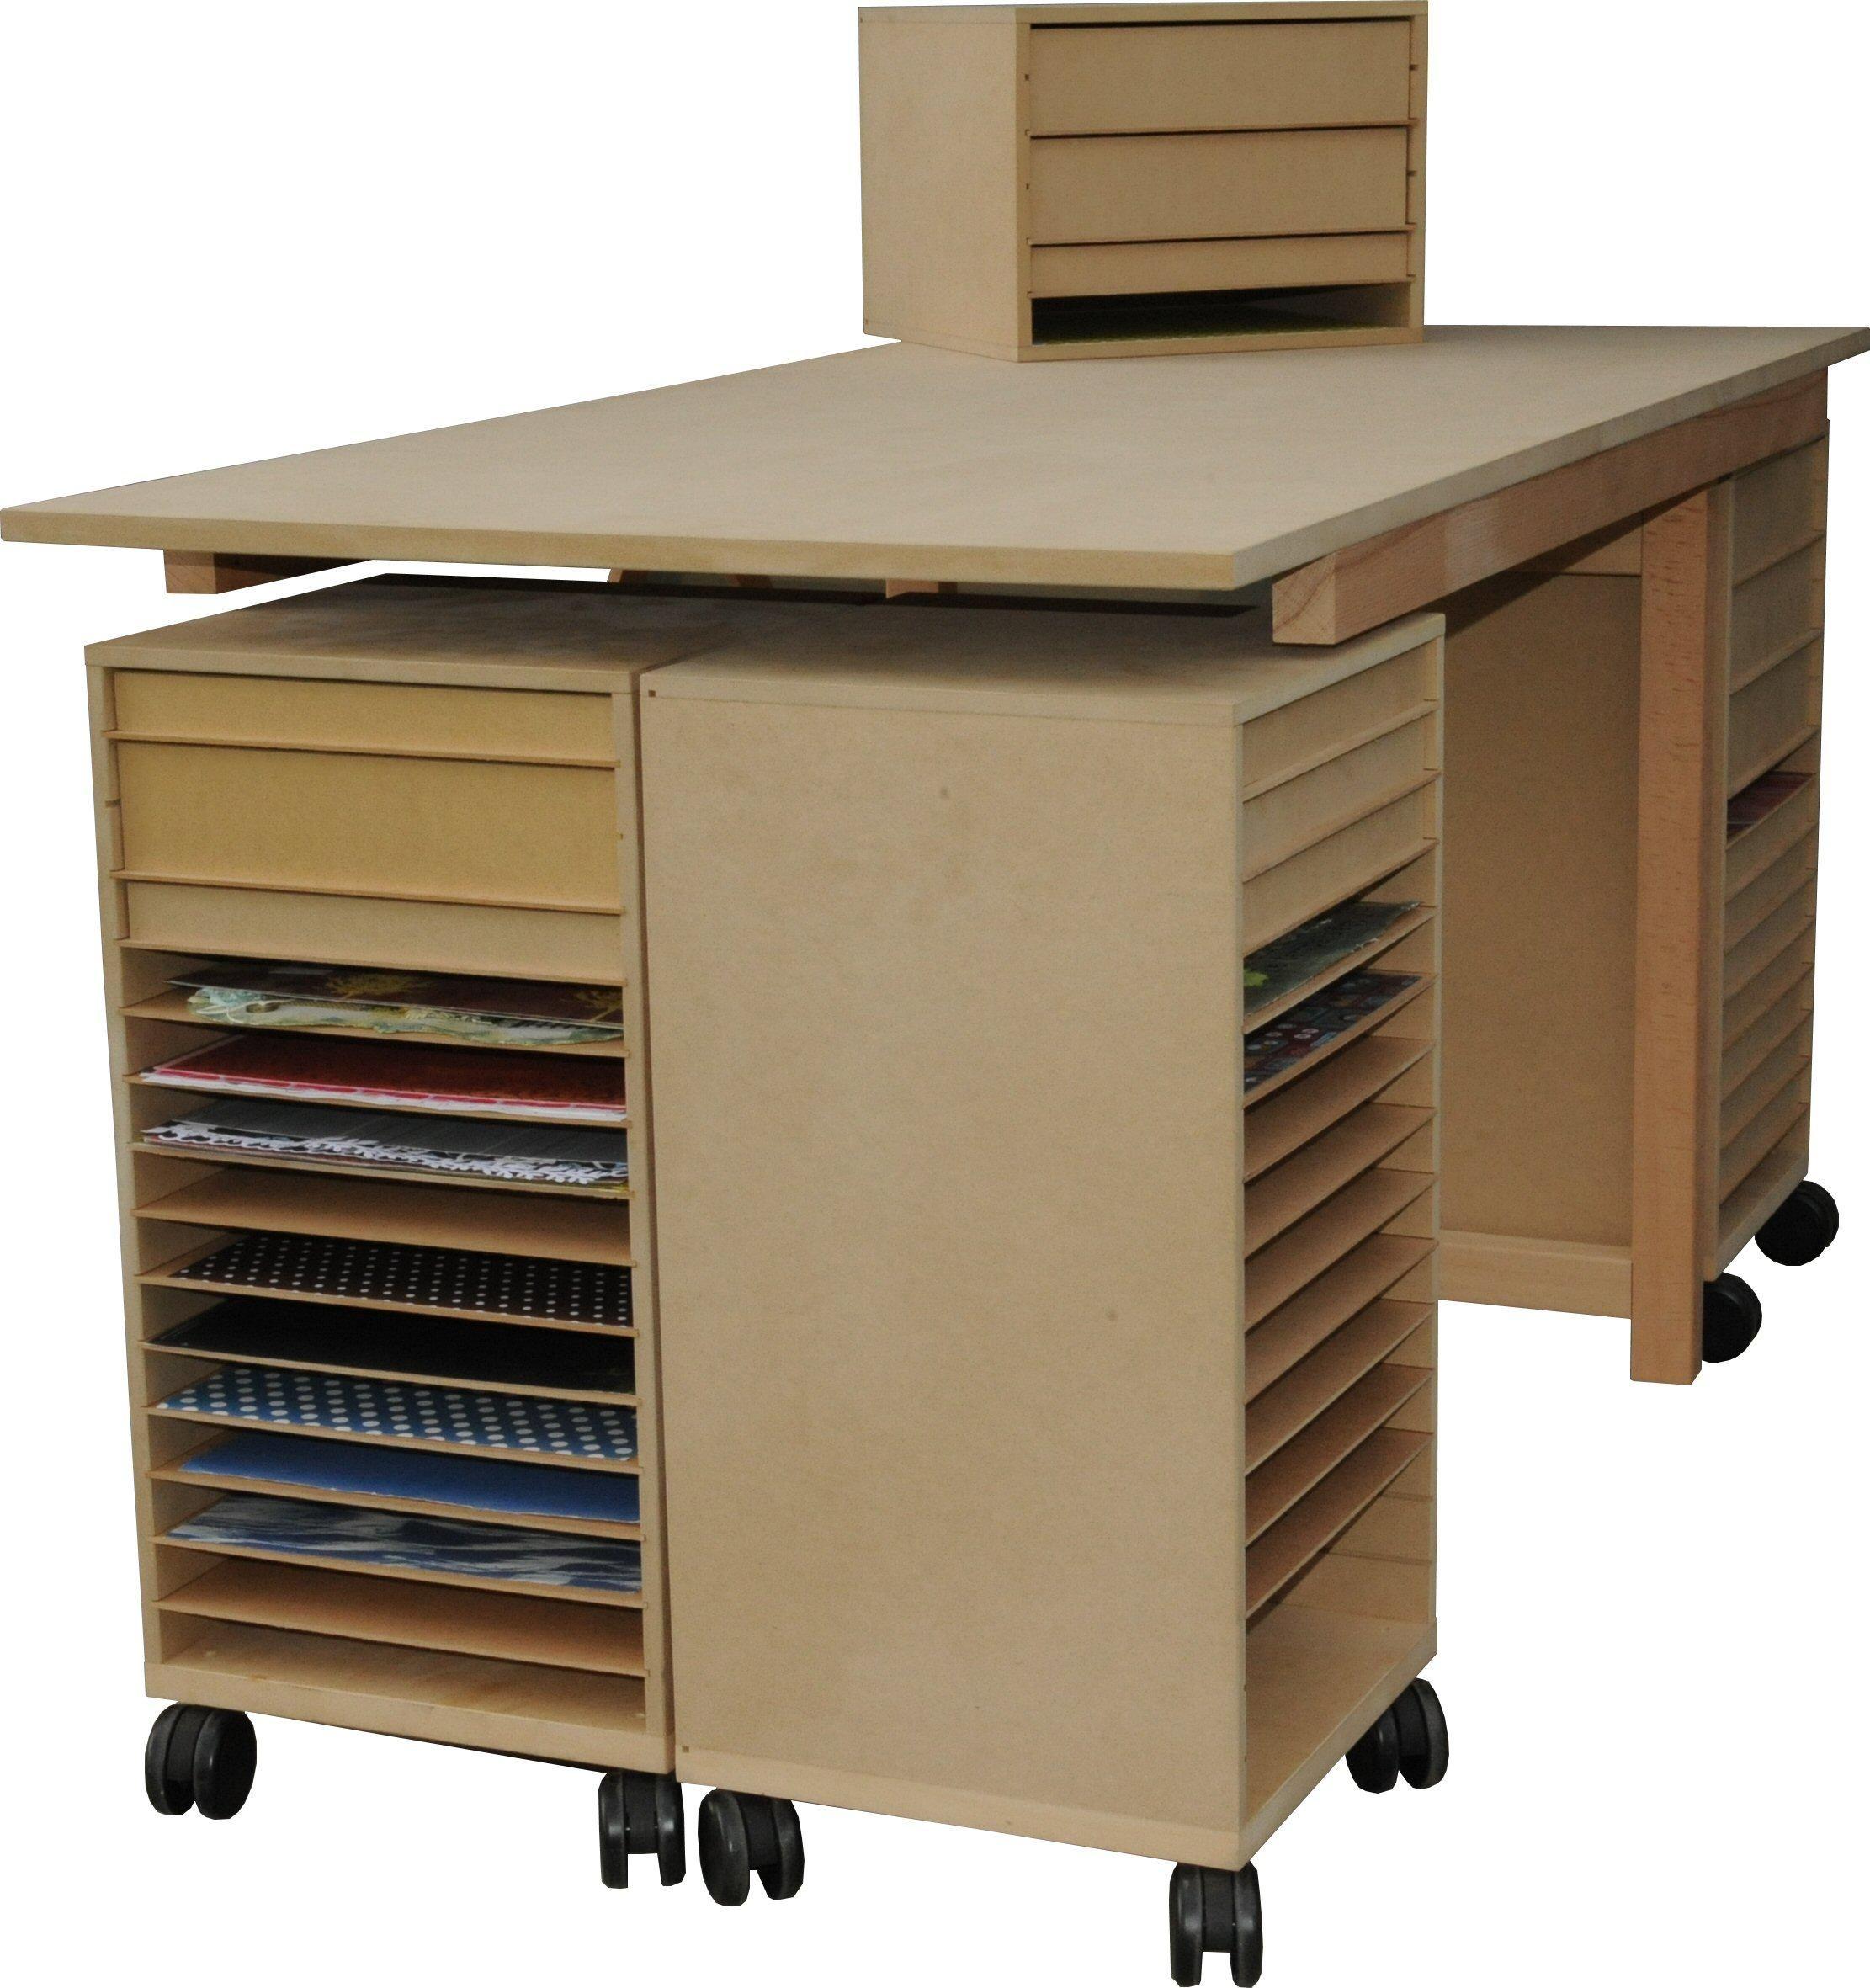 Meuble Scrapbooking Meuble En Bois Pour Loisirs Creatifs Scrapbooking Rangement Meuble Atelier Rangement Art